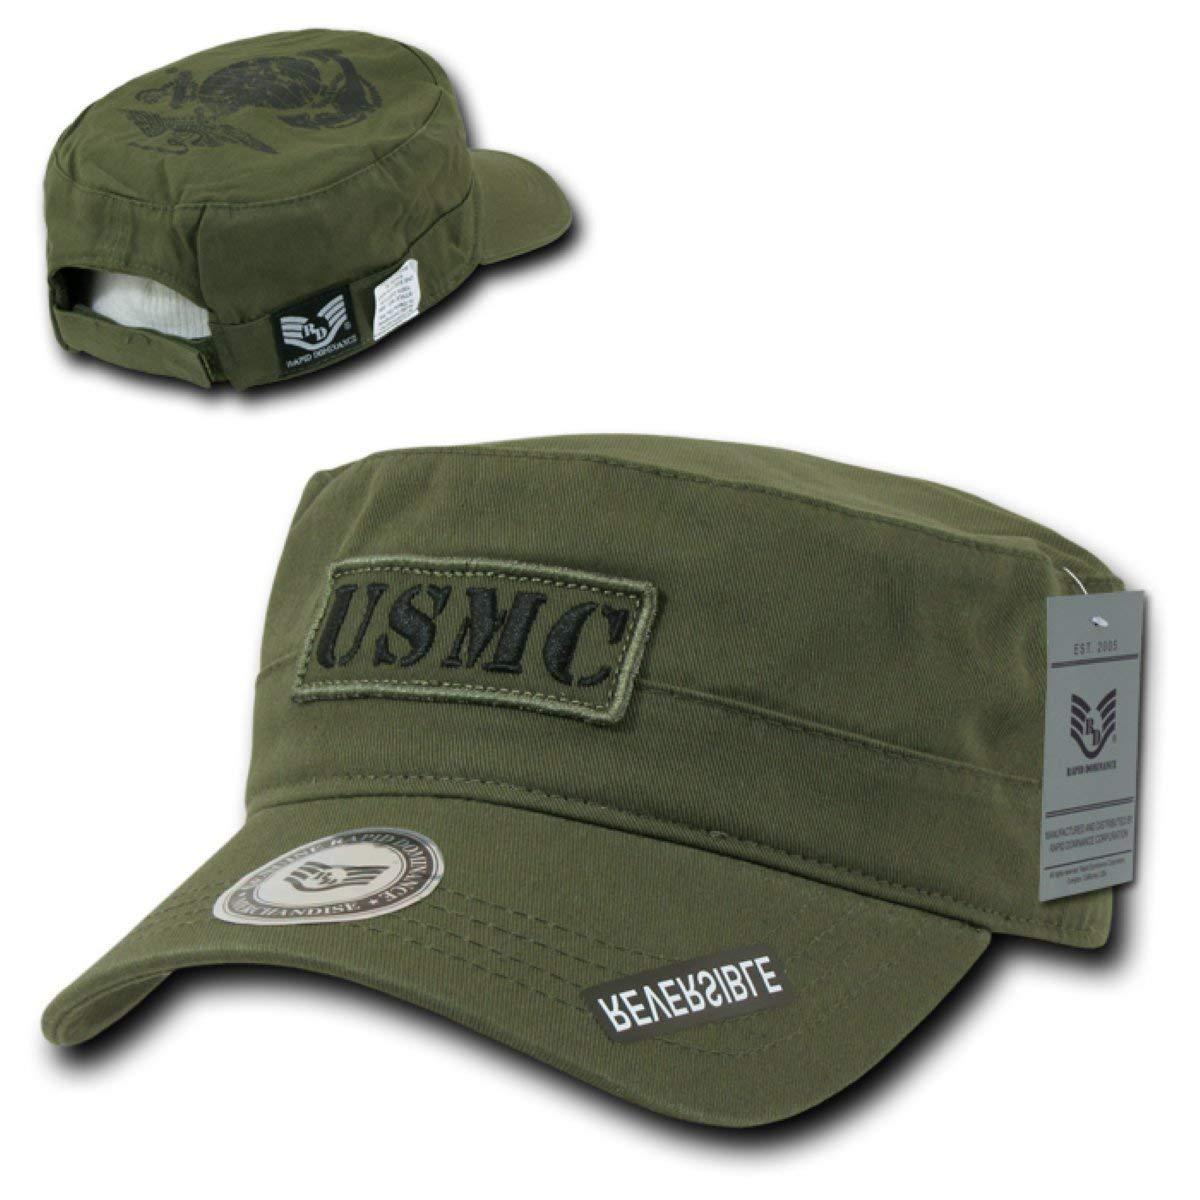 cf64125d0bf Get Quotations · Rapid Dominance Cadet Reversible Vintage Reversible Military  Cap USMC